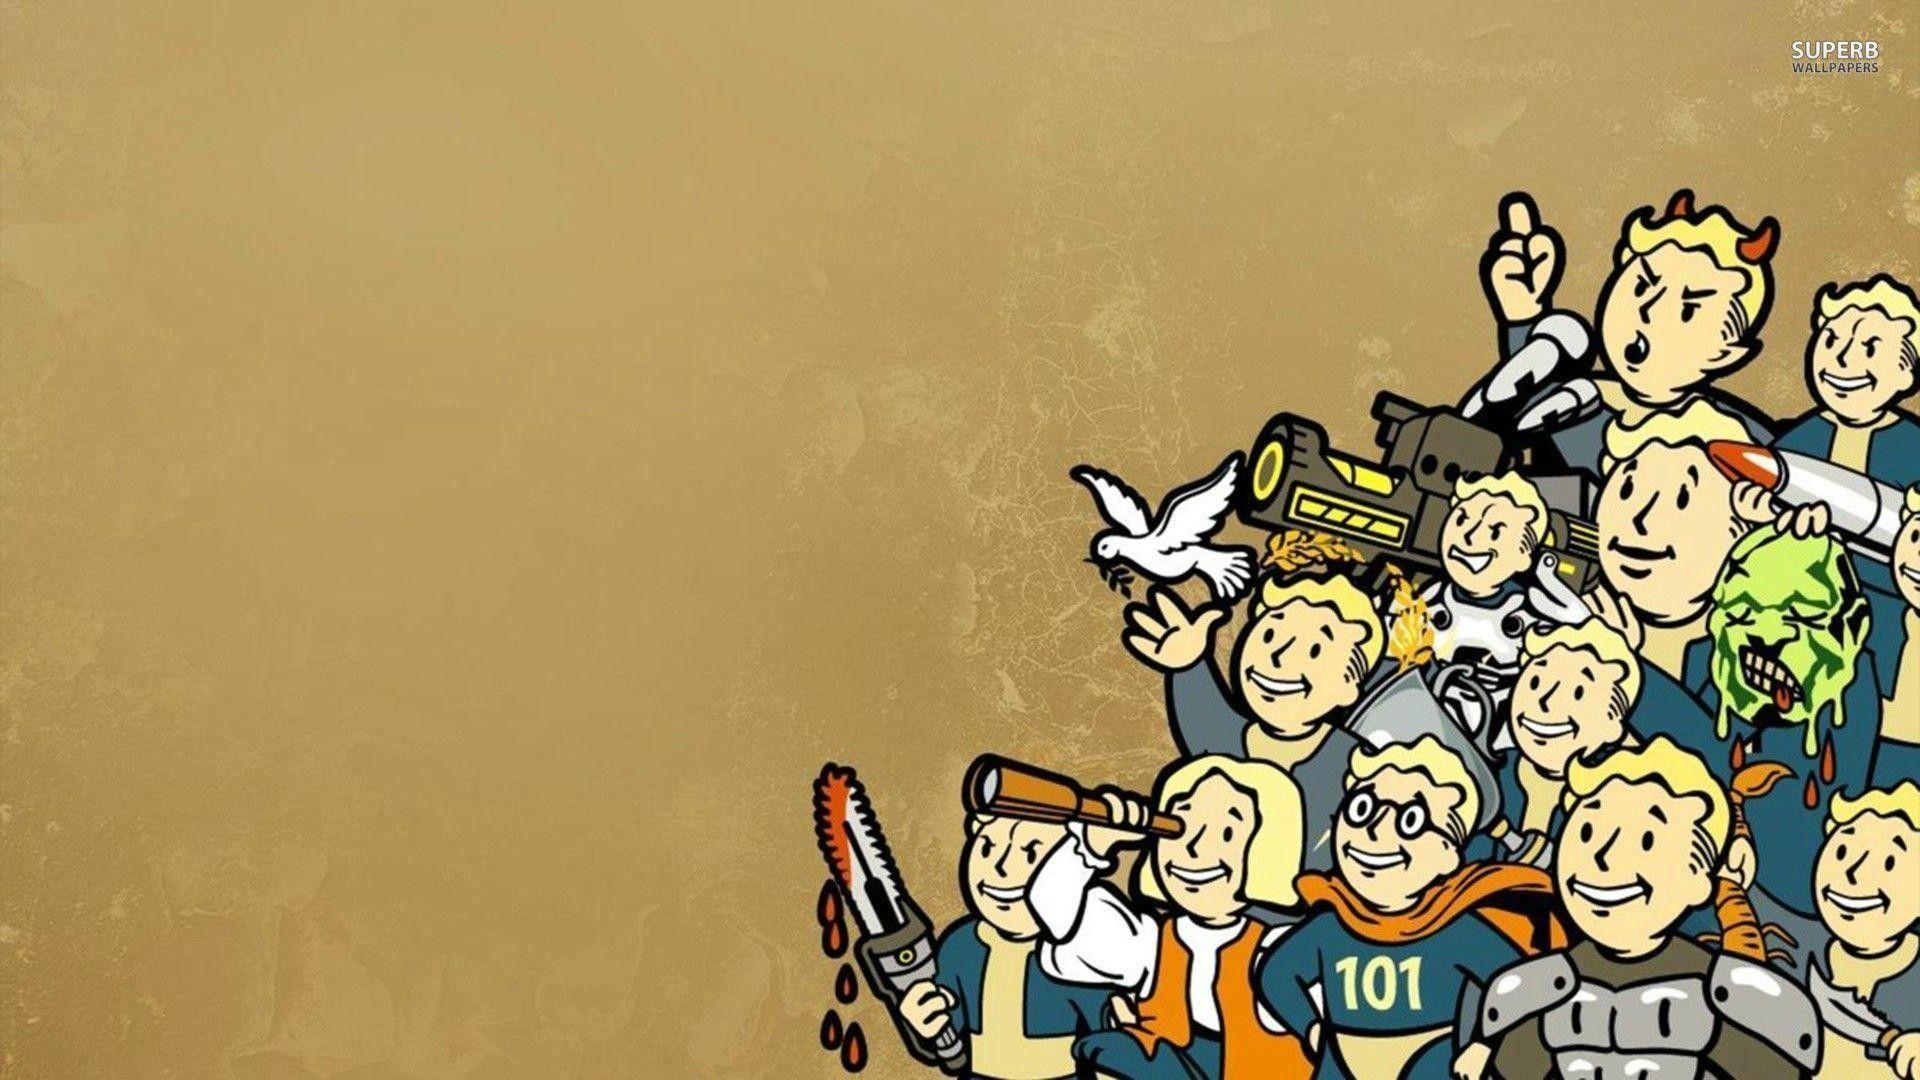 1920x1080 Vault Boy Fallout wallpaper Game wallpapers